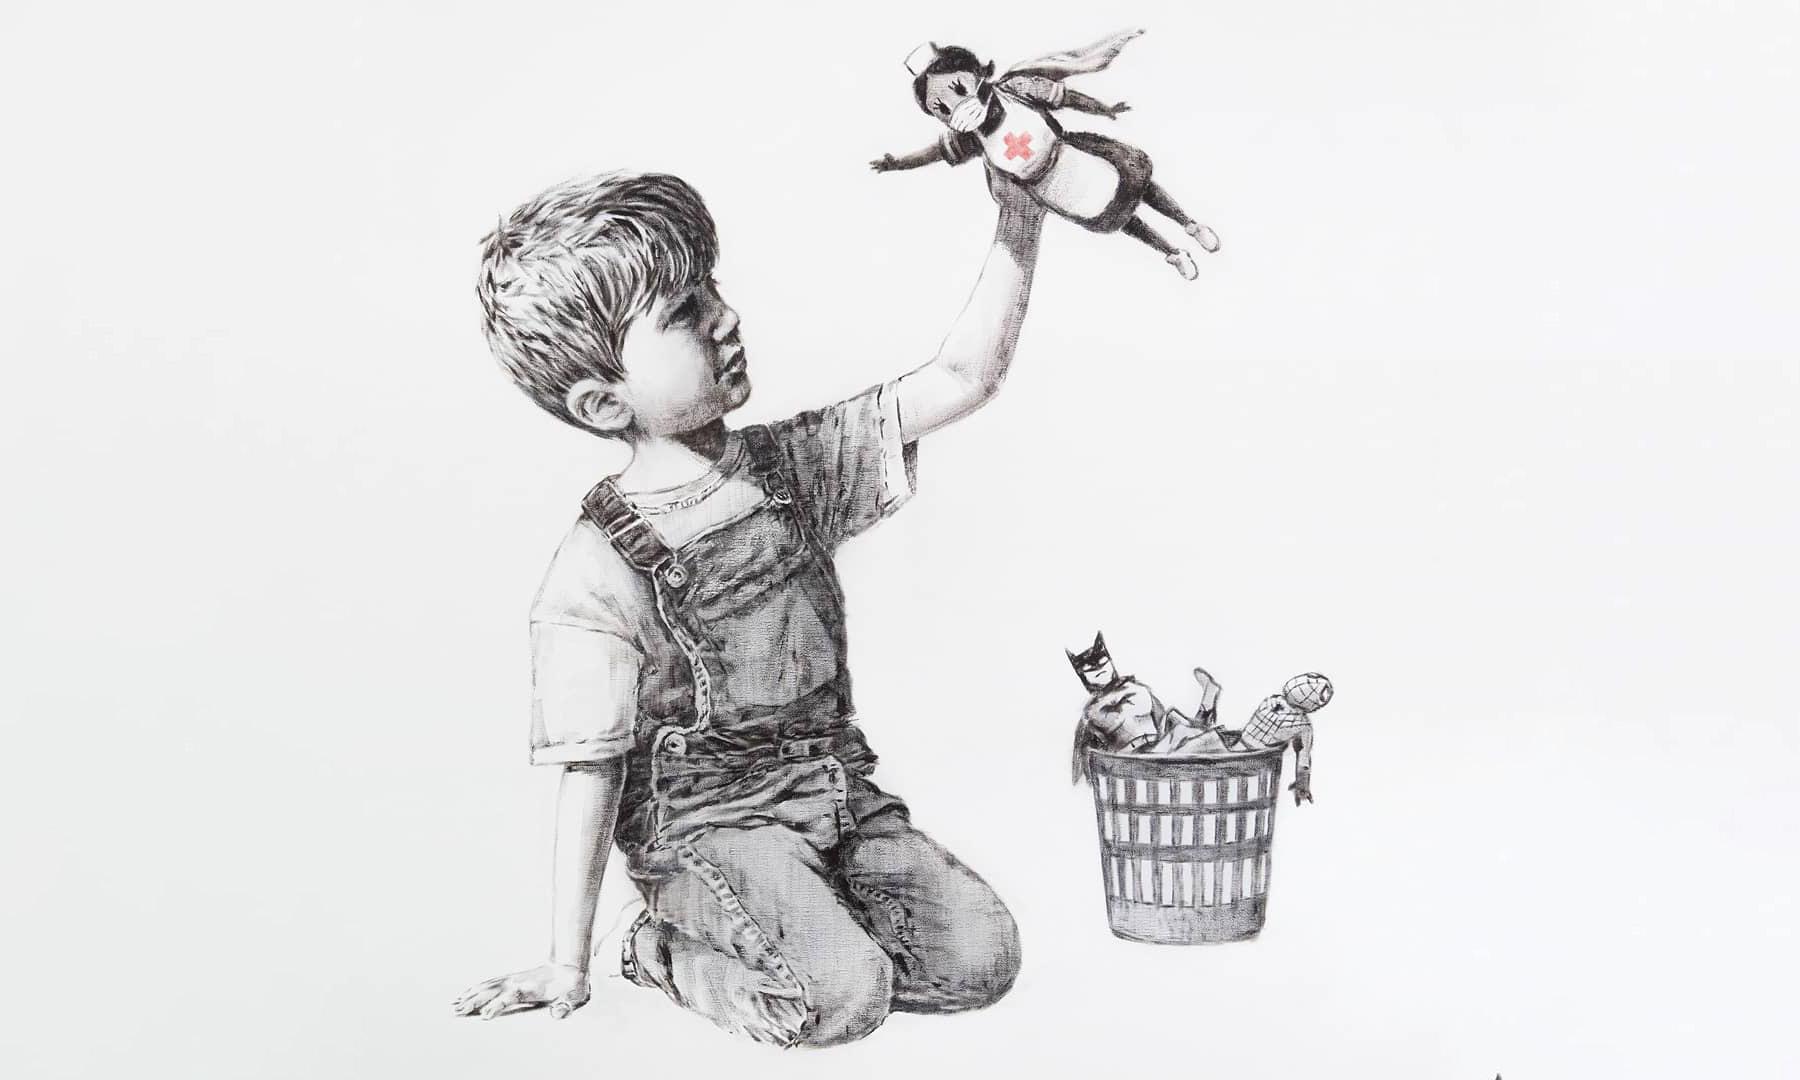 Banksy 新作品向医护人员致敬